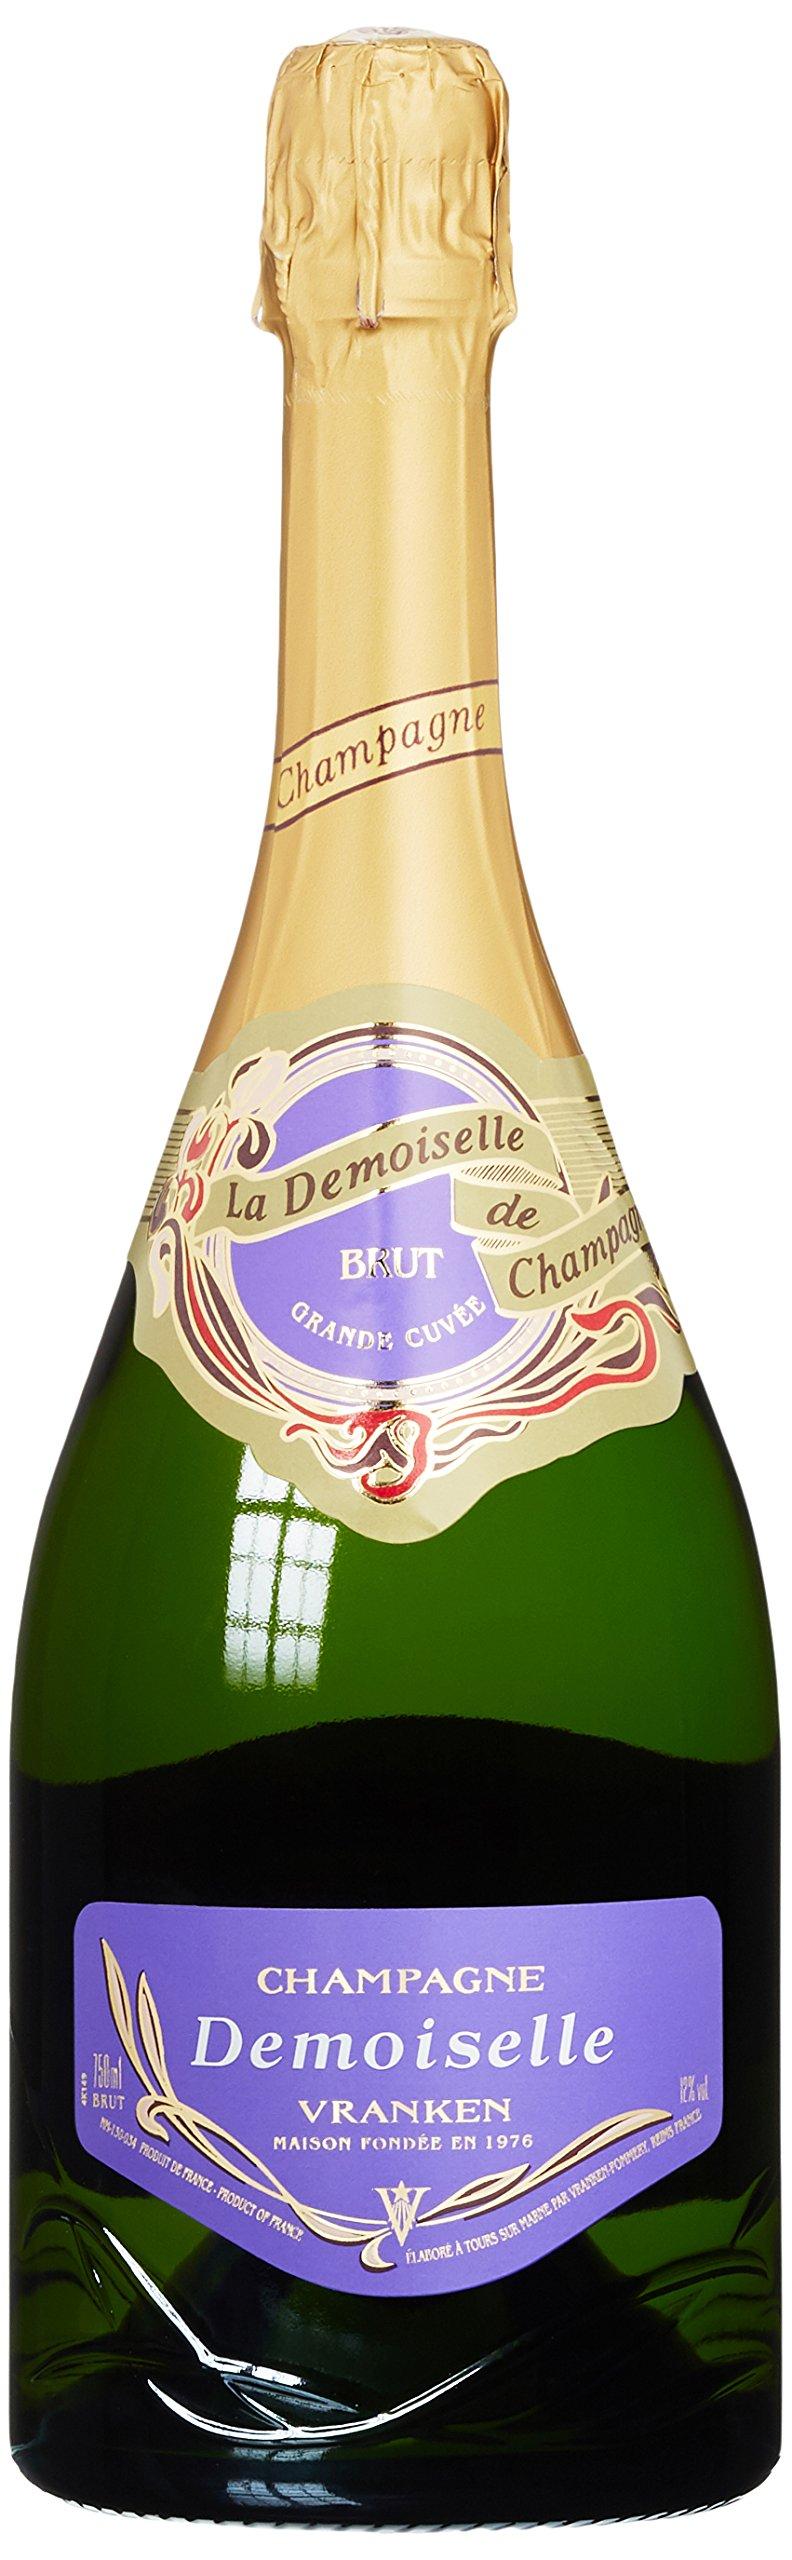 Demoiselle-Brut-1-x-075-l